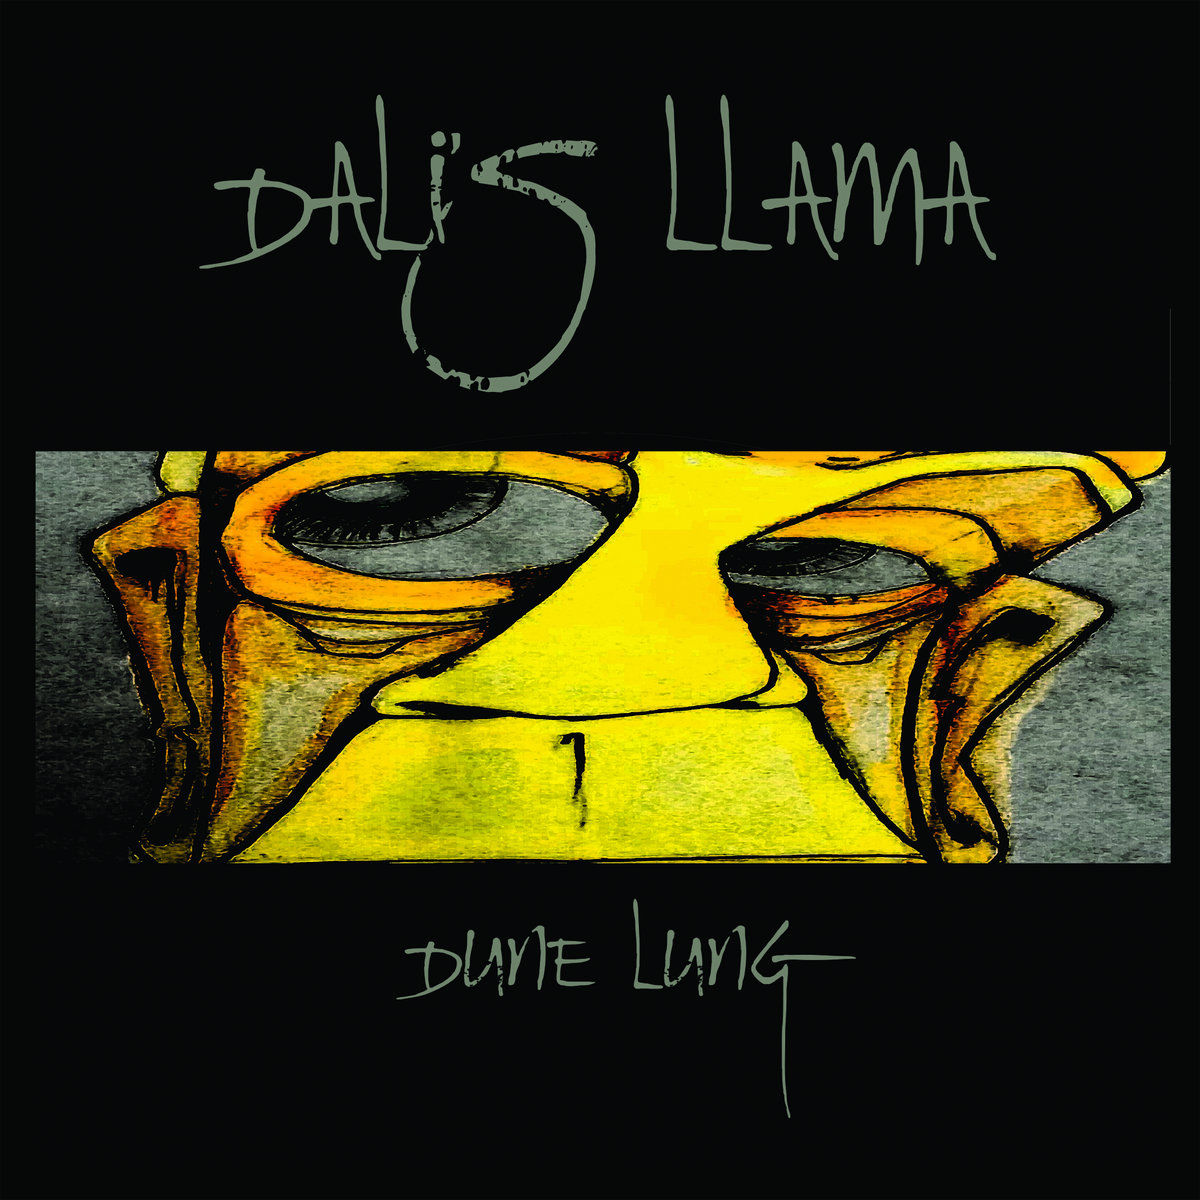 dalis llama dune lung